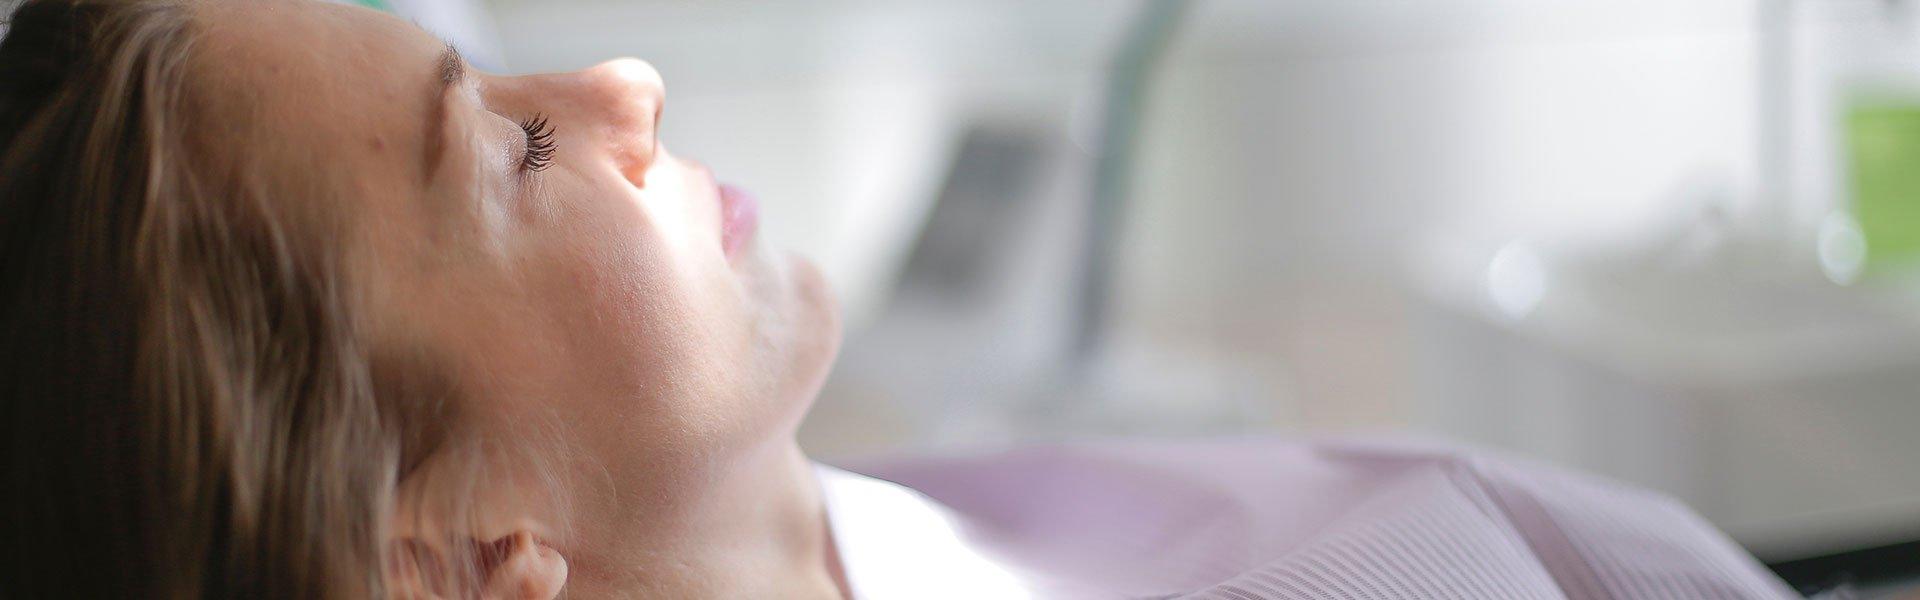 Woman lying in a dental chair